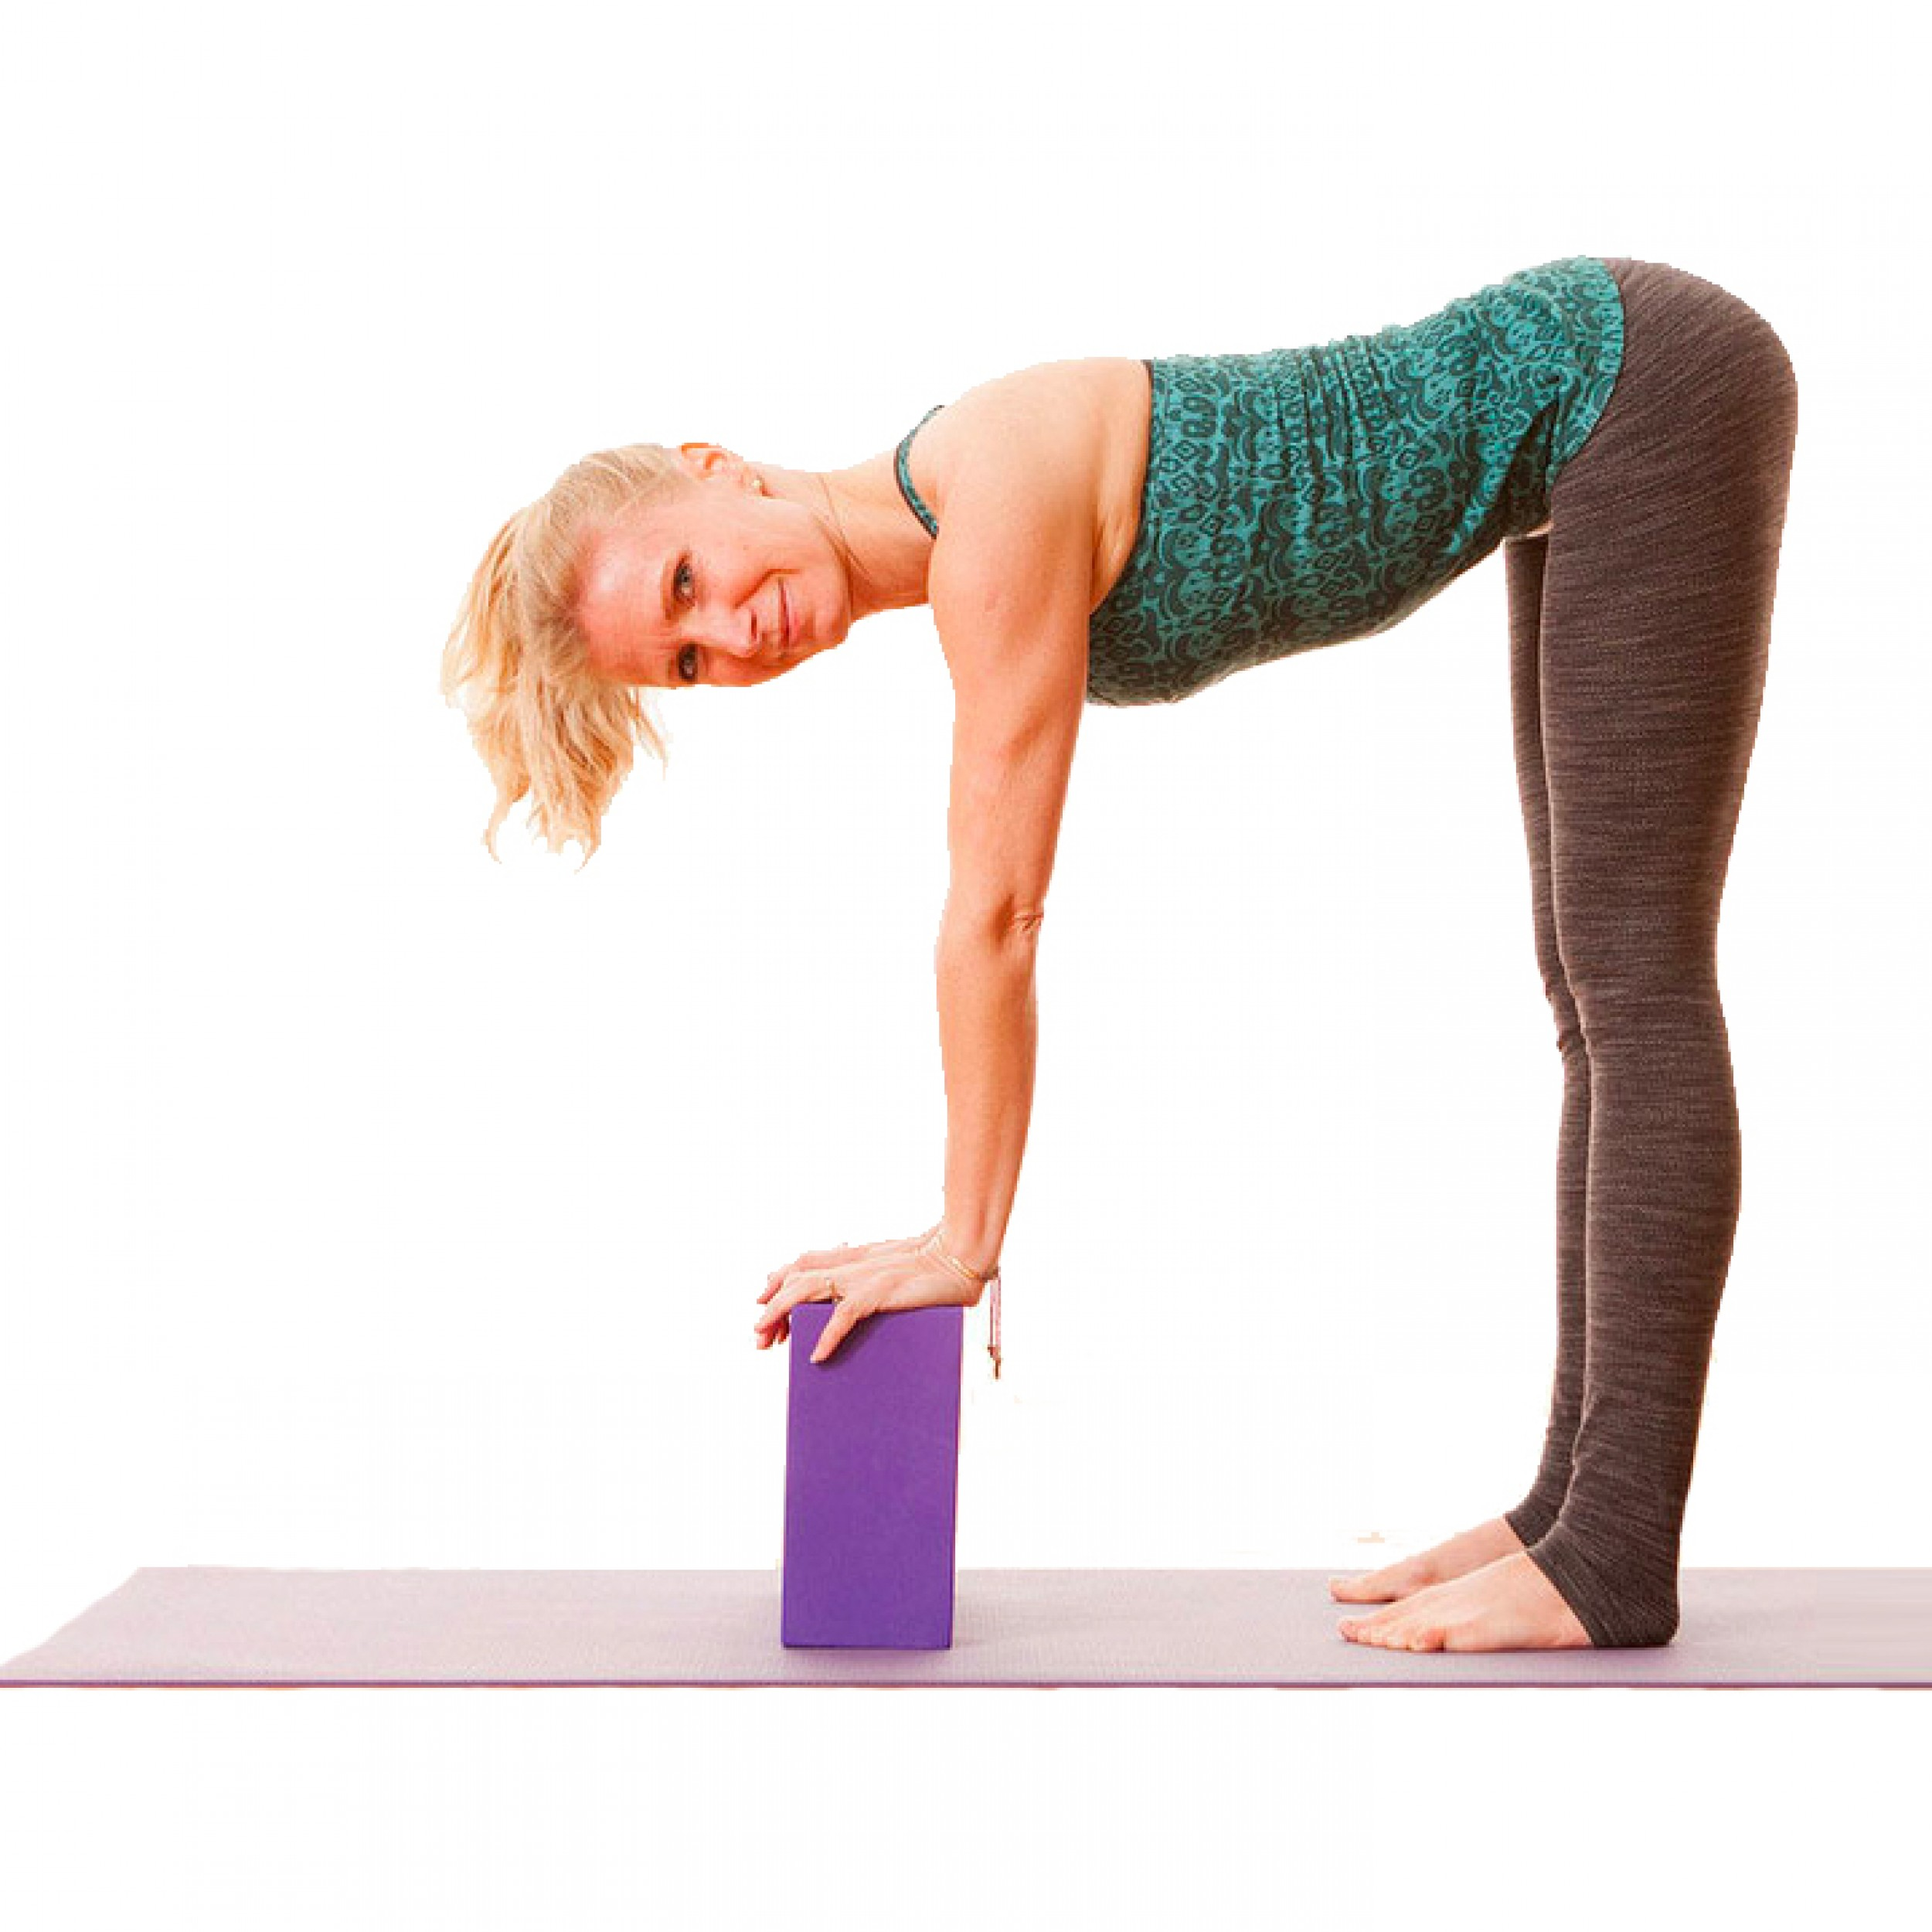 Hatha Yoga for Beginners - Ekhart Yoga